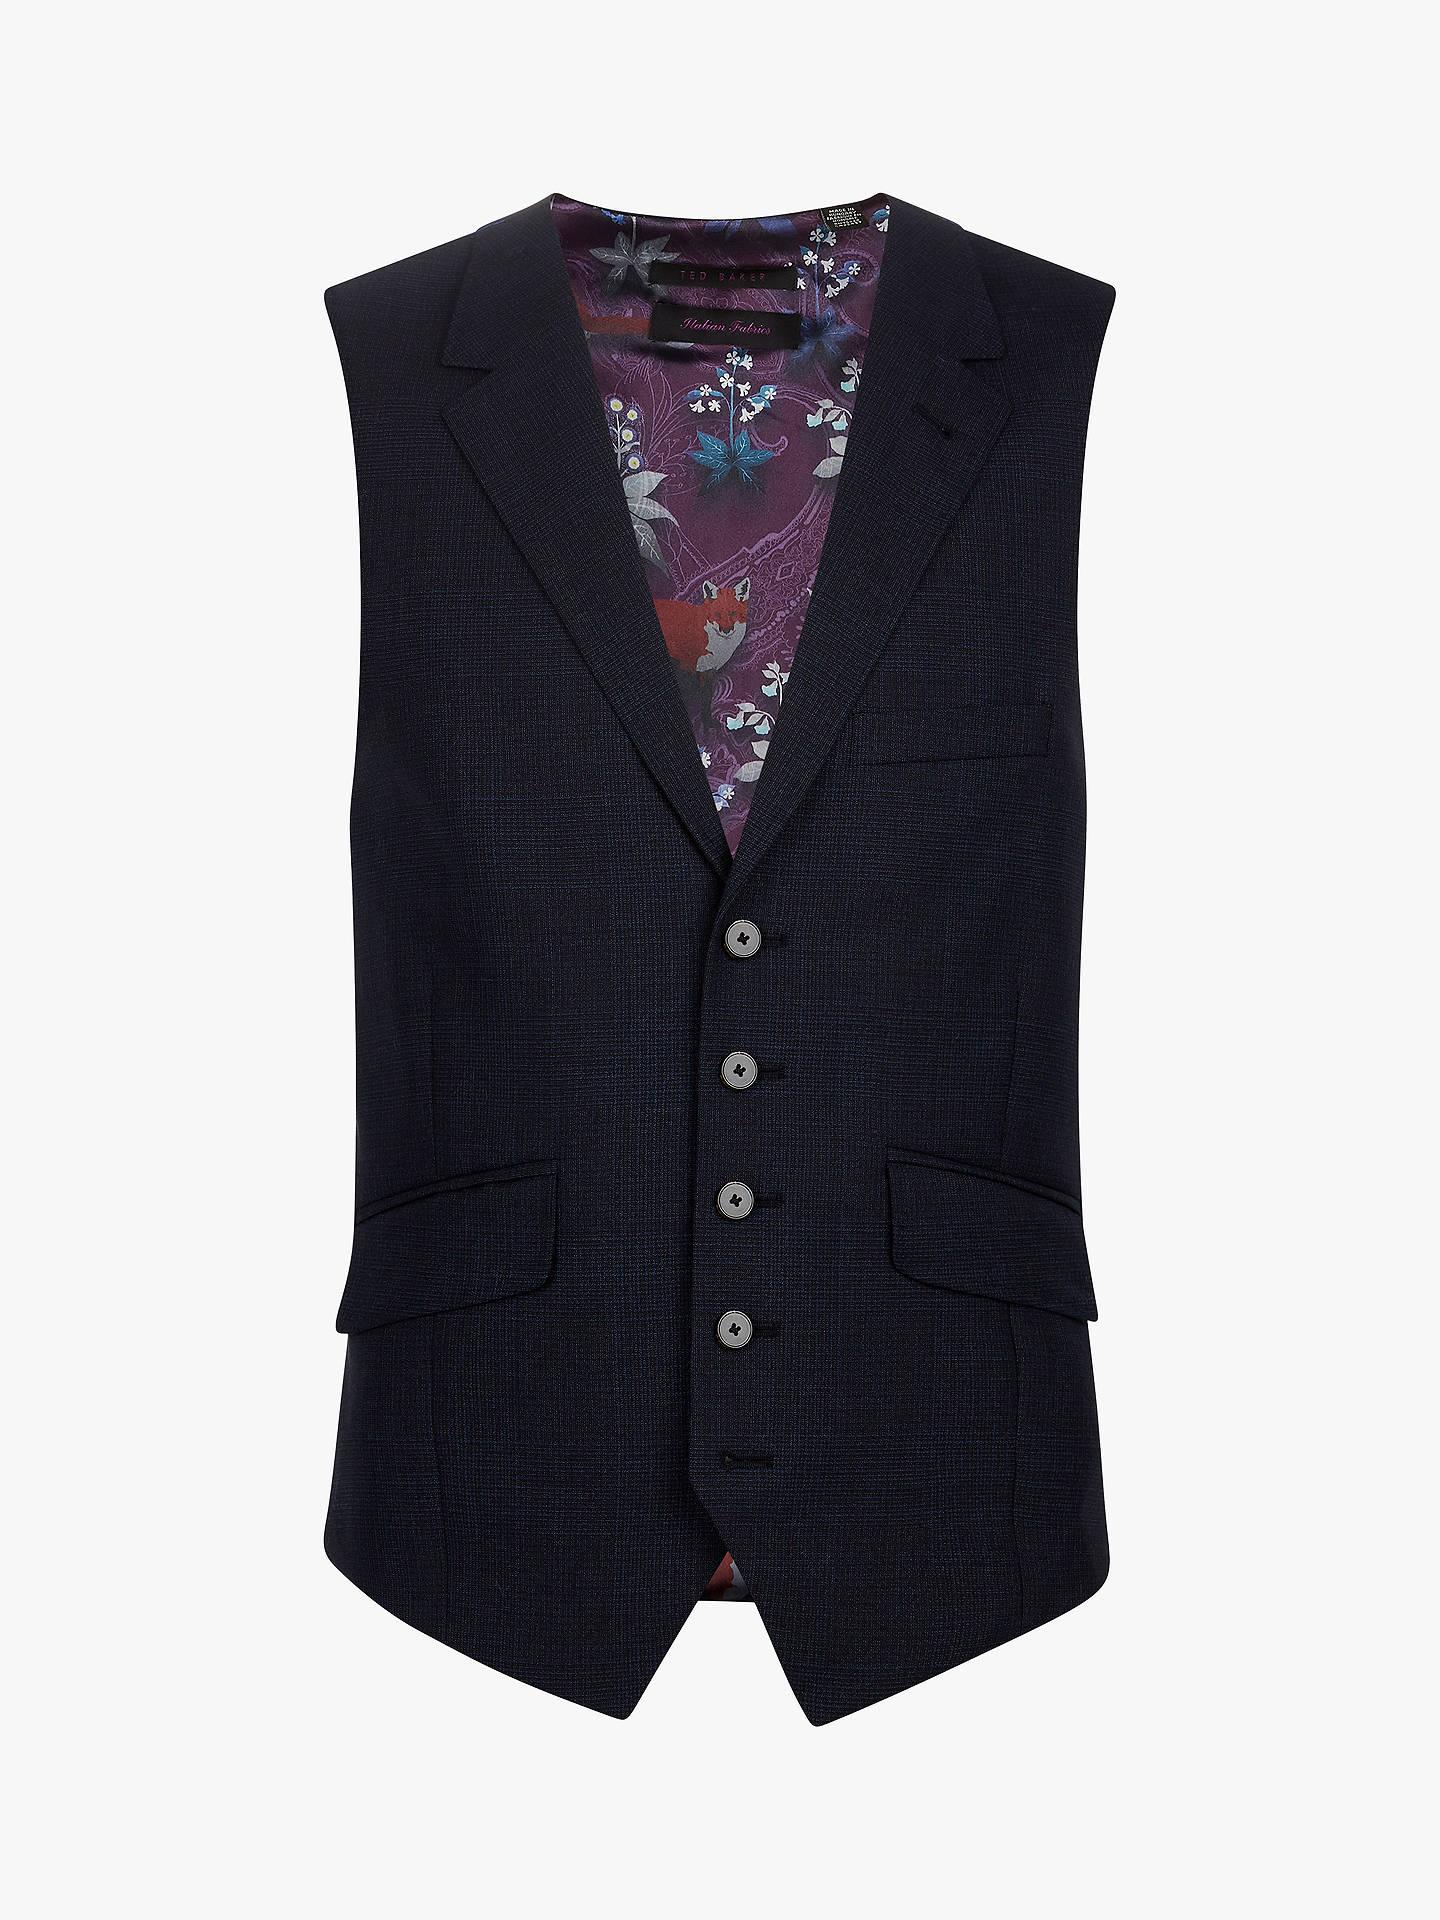 7a4c10563f66e9 Homepage · Men · Men s Waistcoats. Buy Ted Baker Wovin Waistcoat